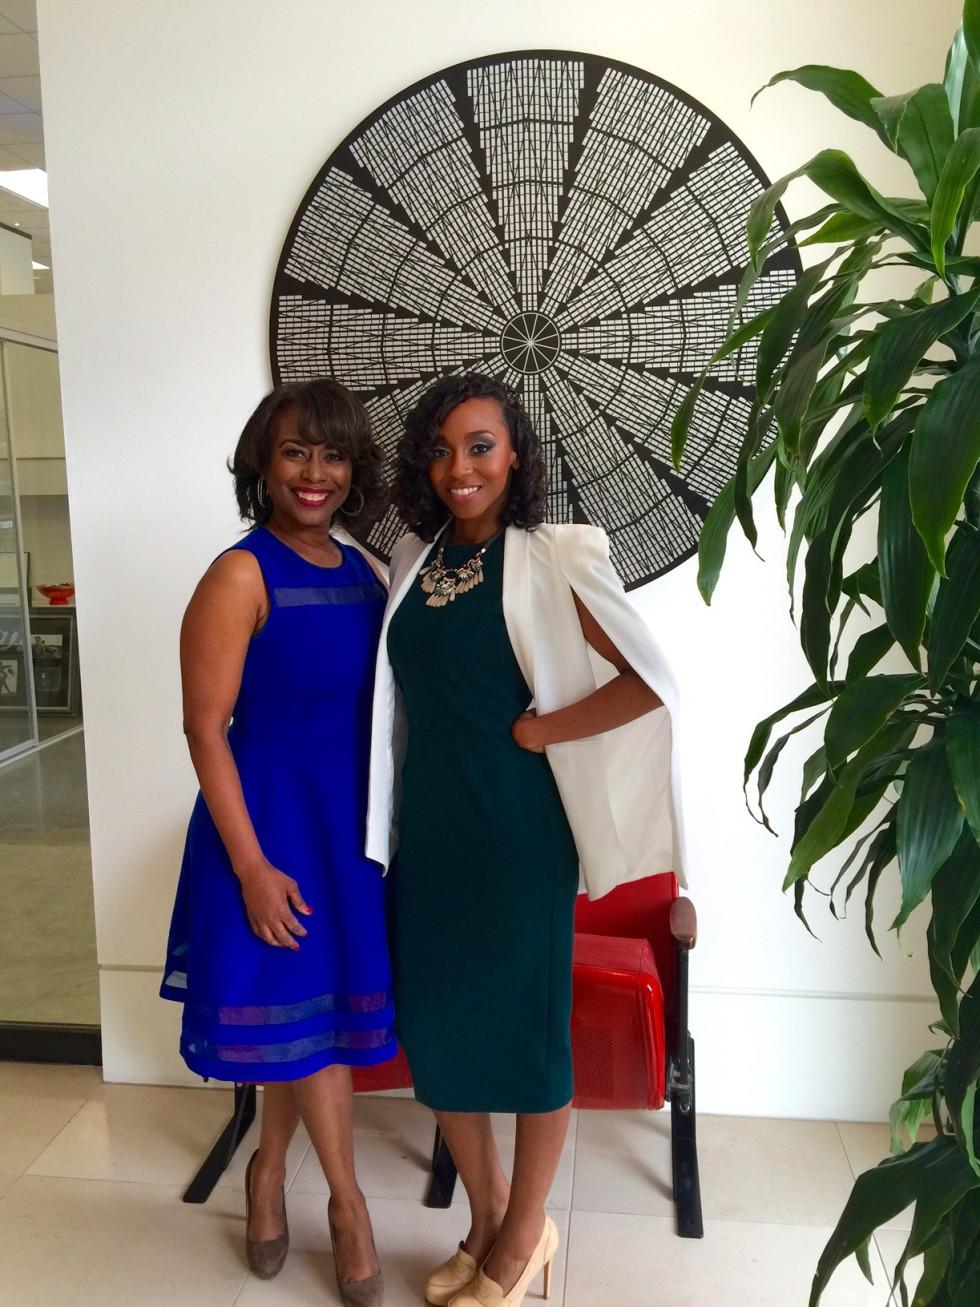 Sisters in Law, Vivian King, Tiye Foley